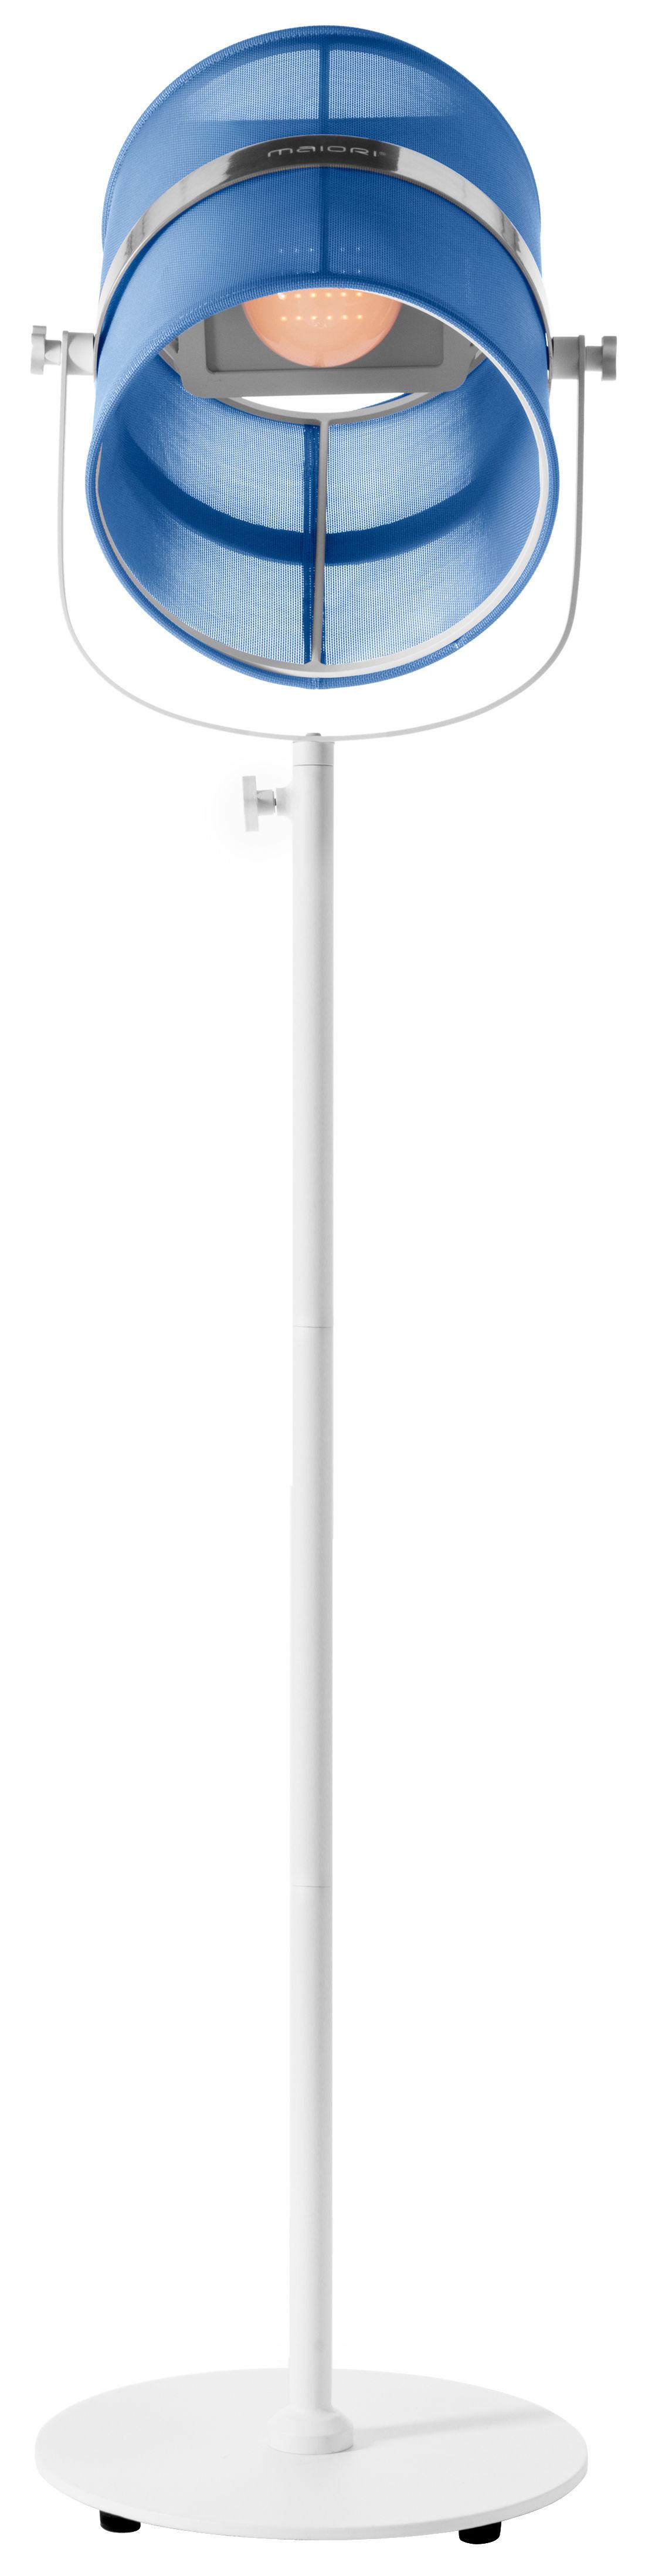 Luminaire - Lampadaires - Lampadaire solaire La Lampe Paris LED / Sans fil - Dock USB - Maiori - Bleu royal / Pied blanc - Aluminium peint, Tissu